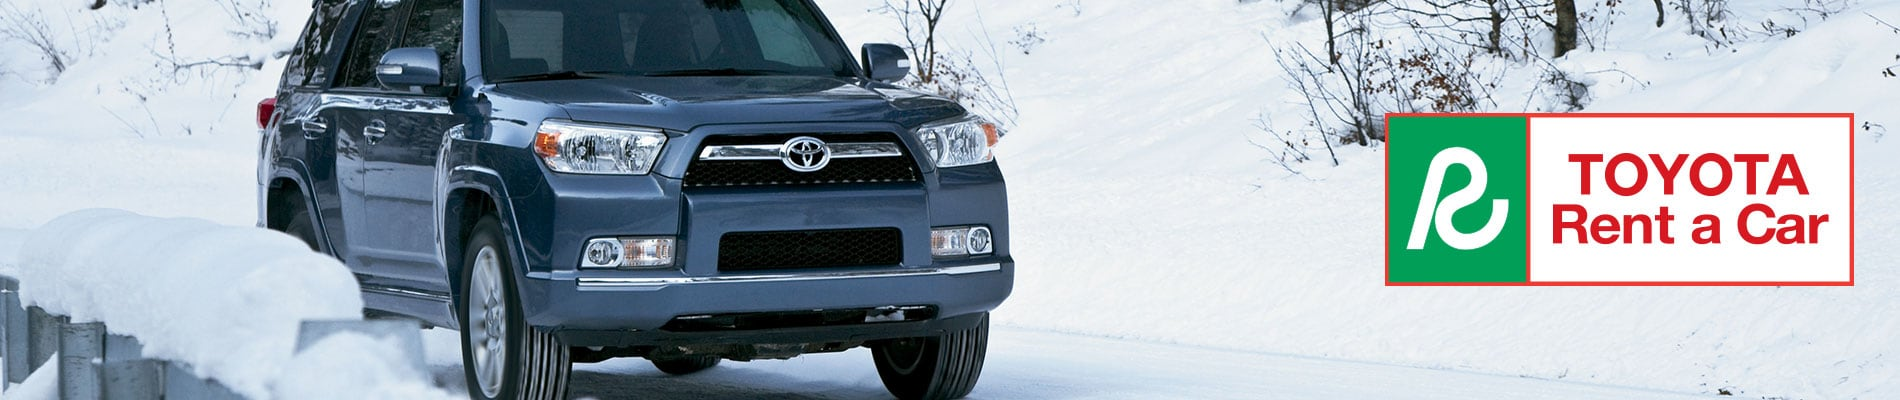 Toyota Rent A Car Santa Rosa Toyota Car Rental At Freeman Toyota